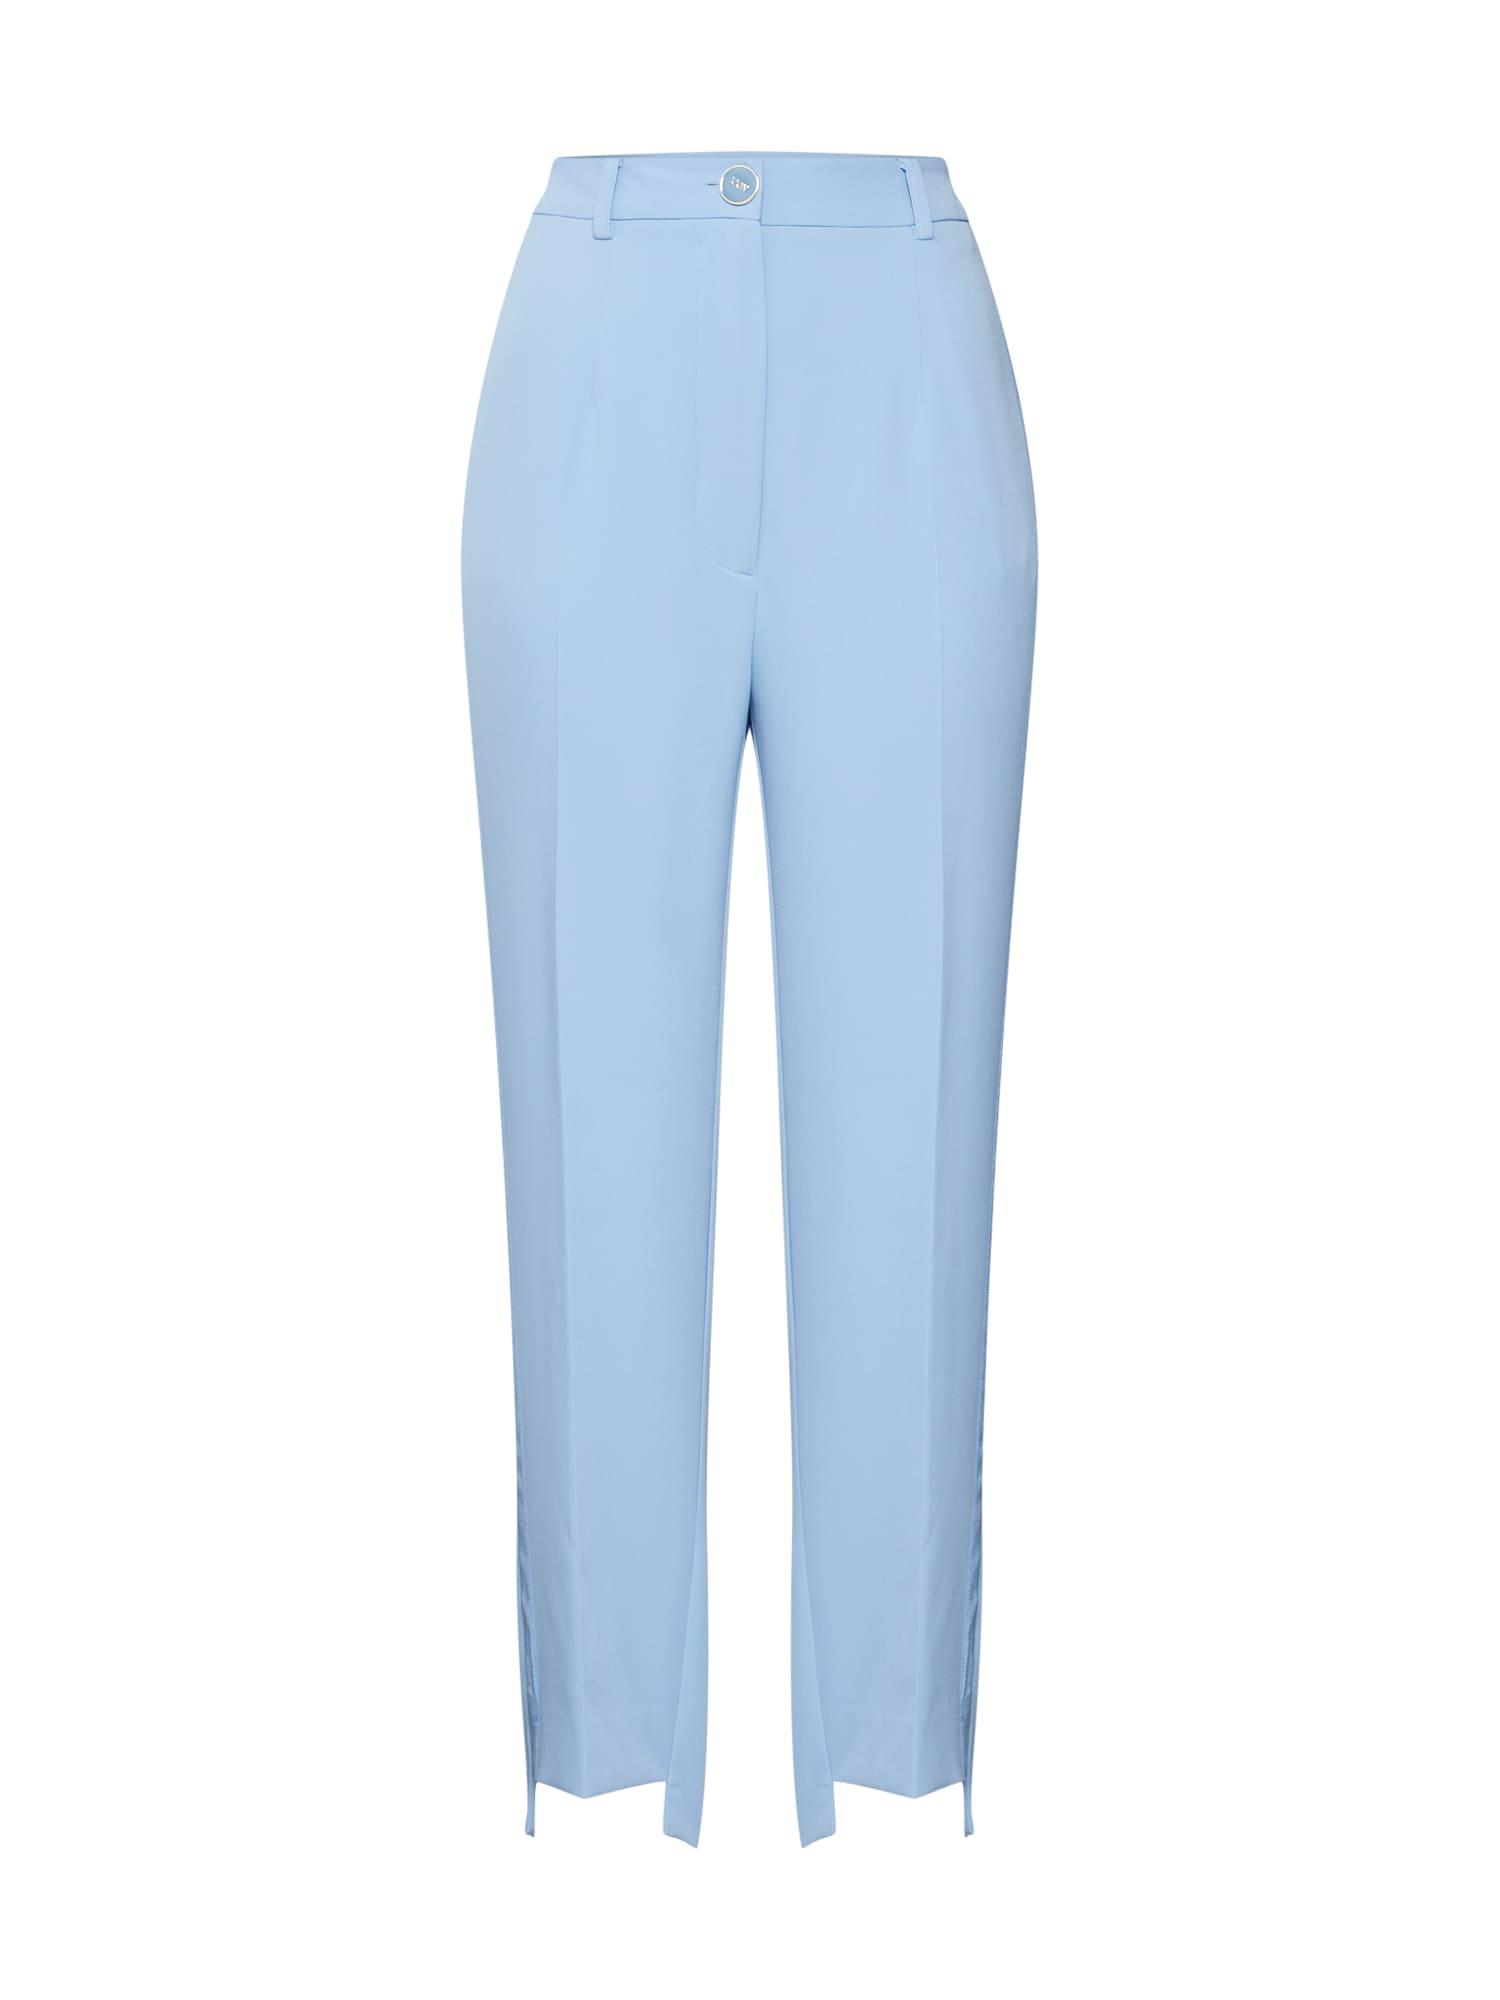 GUESS Kelnės su kantu 'SOPHY' šviesiai mėlyna